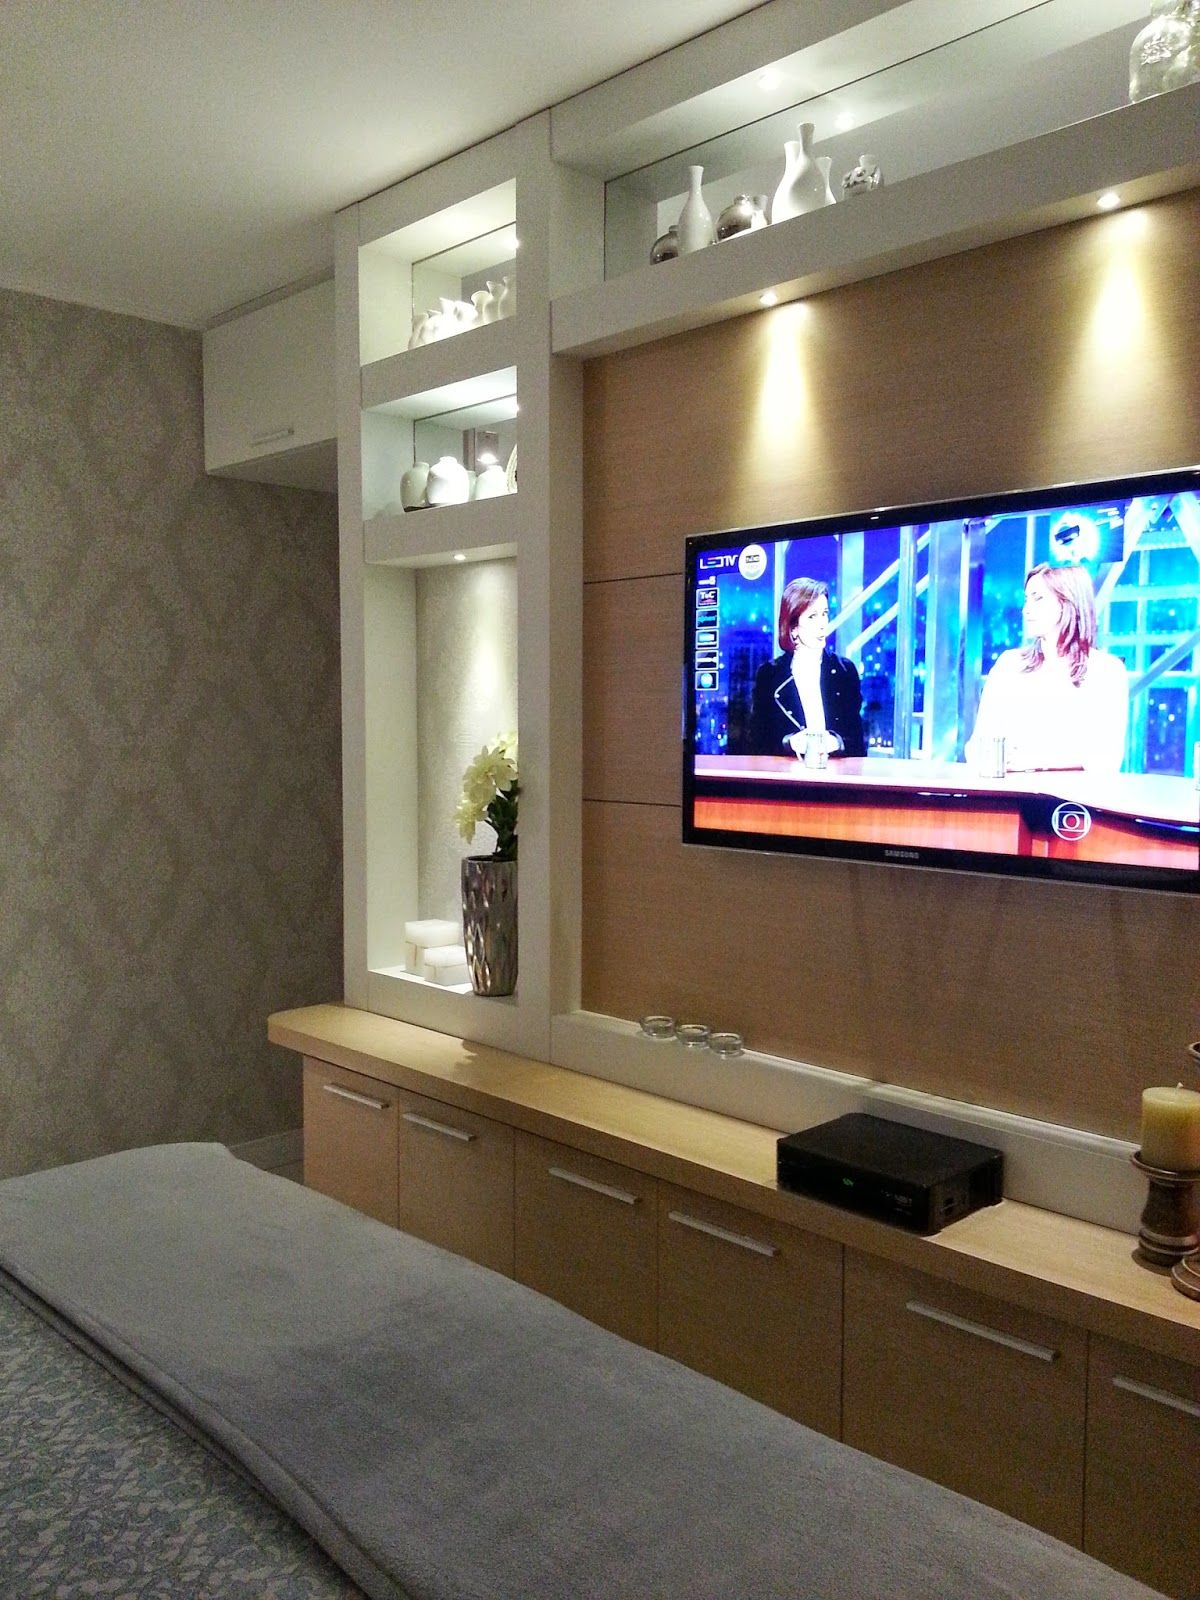 Arquitetura e interiores nichos en 2019 pinterest - Muebles para el televisor ...